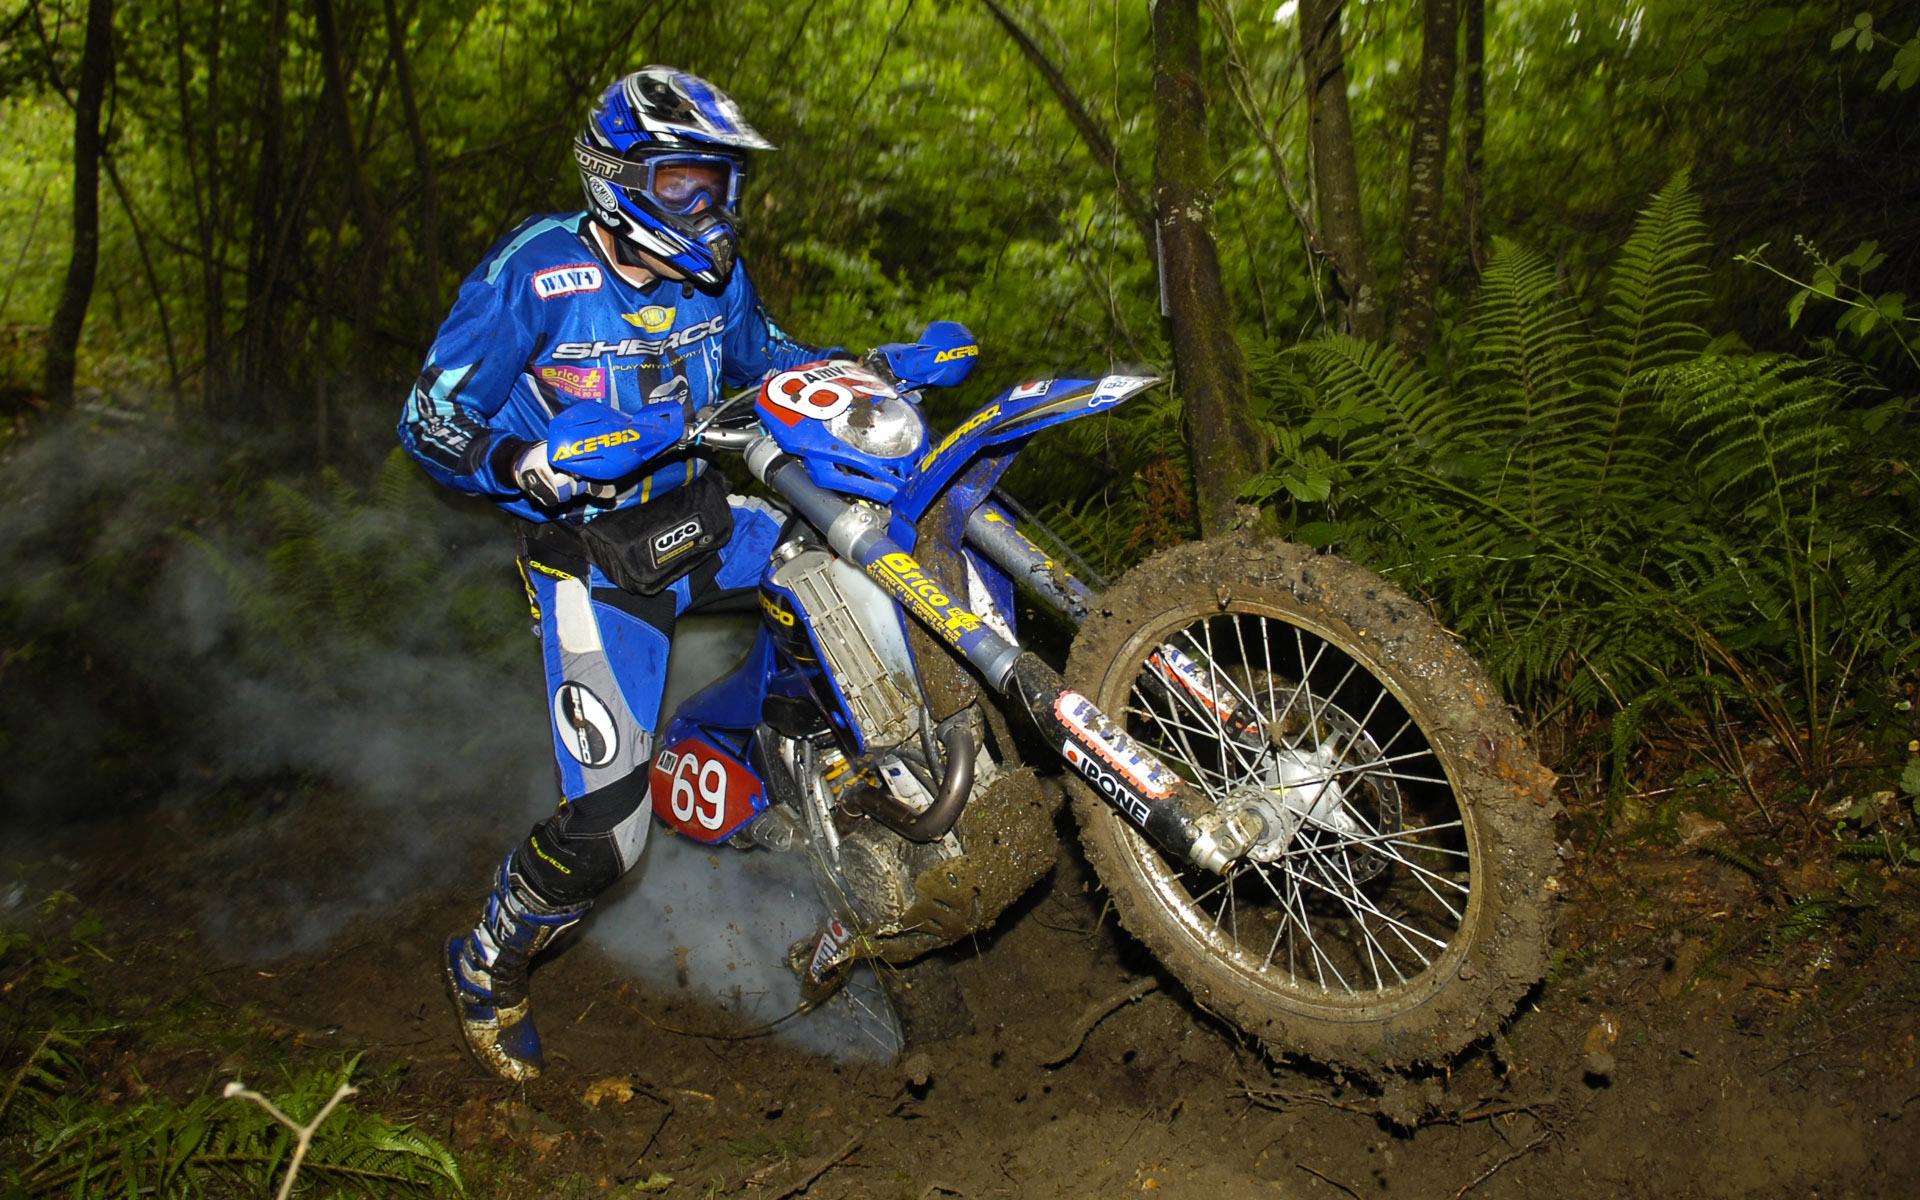 16206 descargar fondo de pantalla Deportes, Personas, Motocross: protectores de pantalla e imágenes gratis